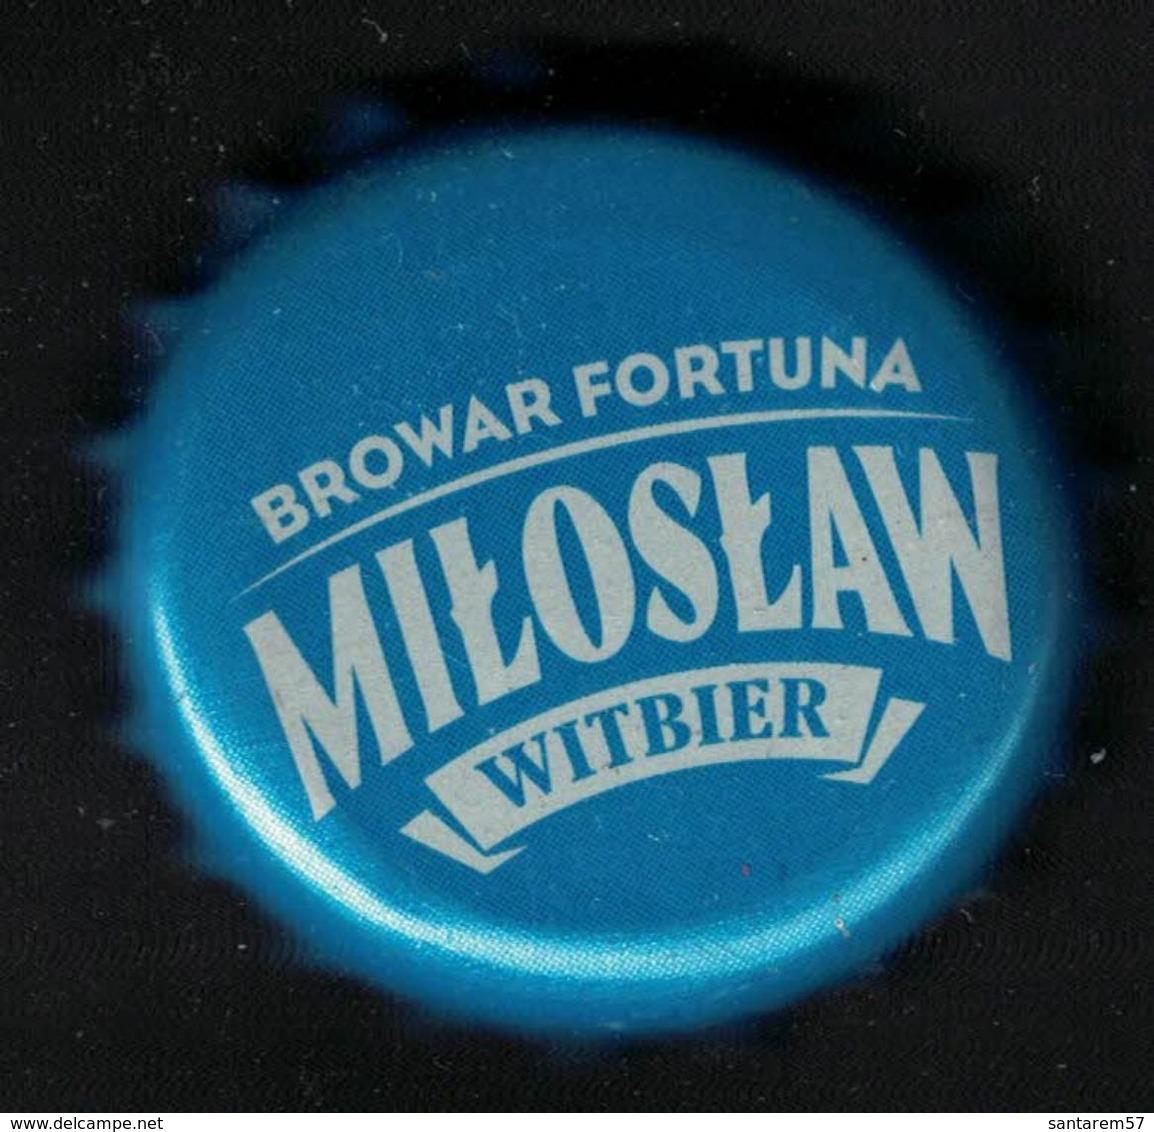 Pologne Capsule Bière Beer Crown Cap Browar Fortuna Miloslaw Witbier - Bière